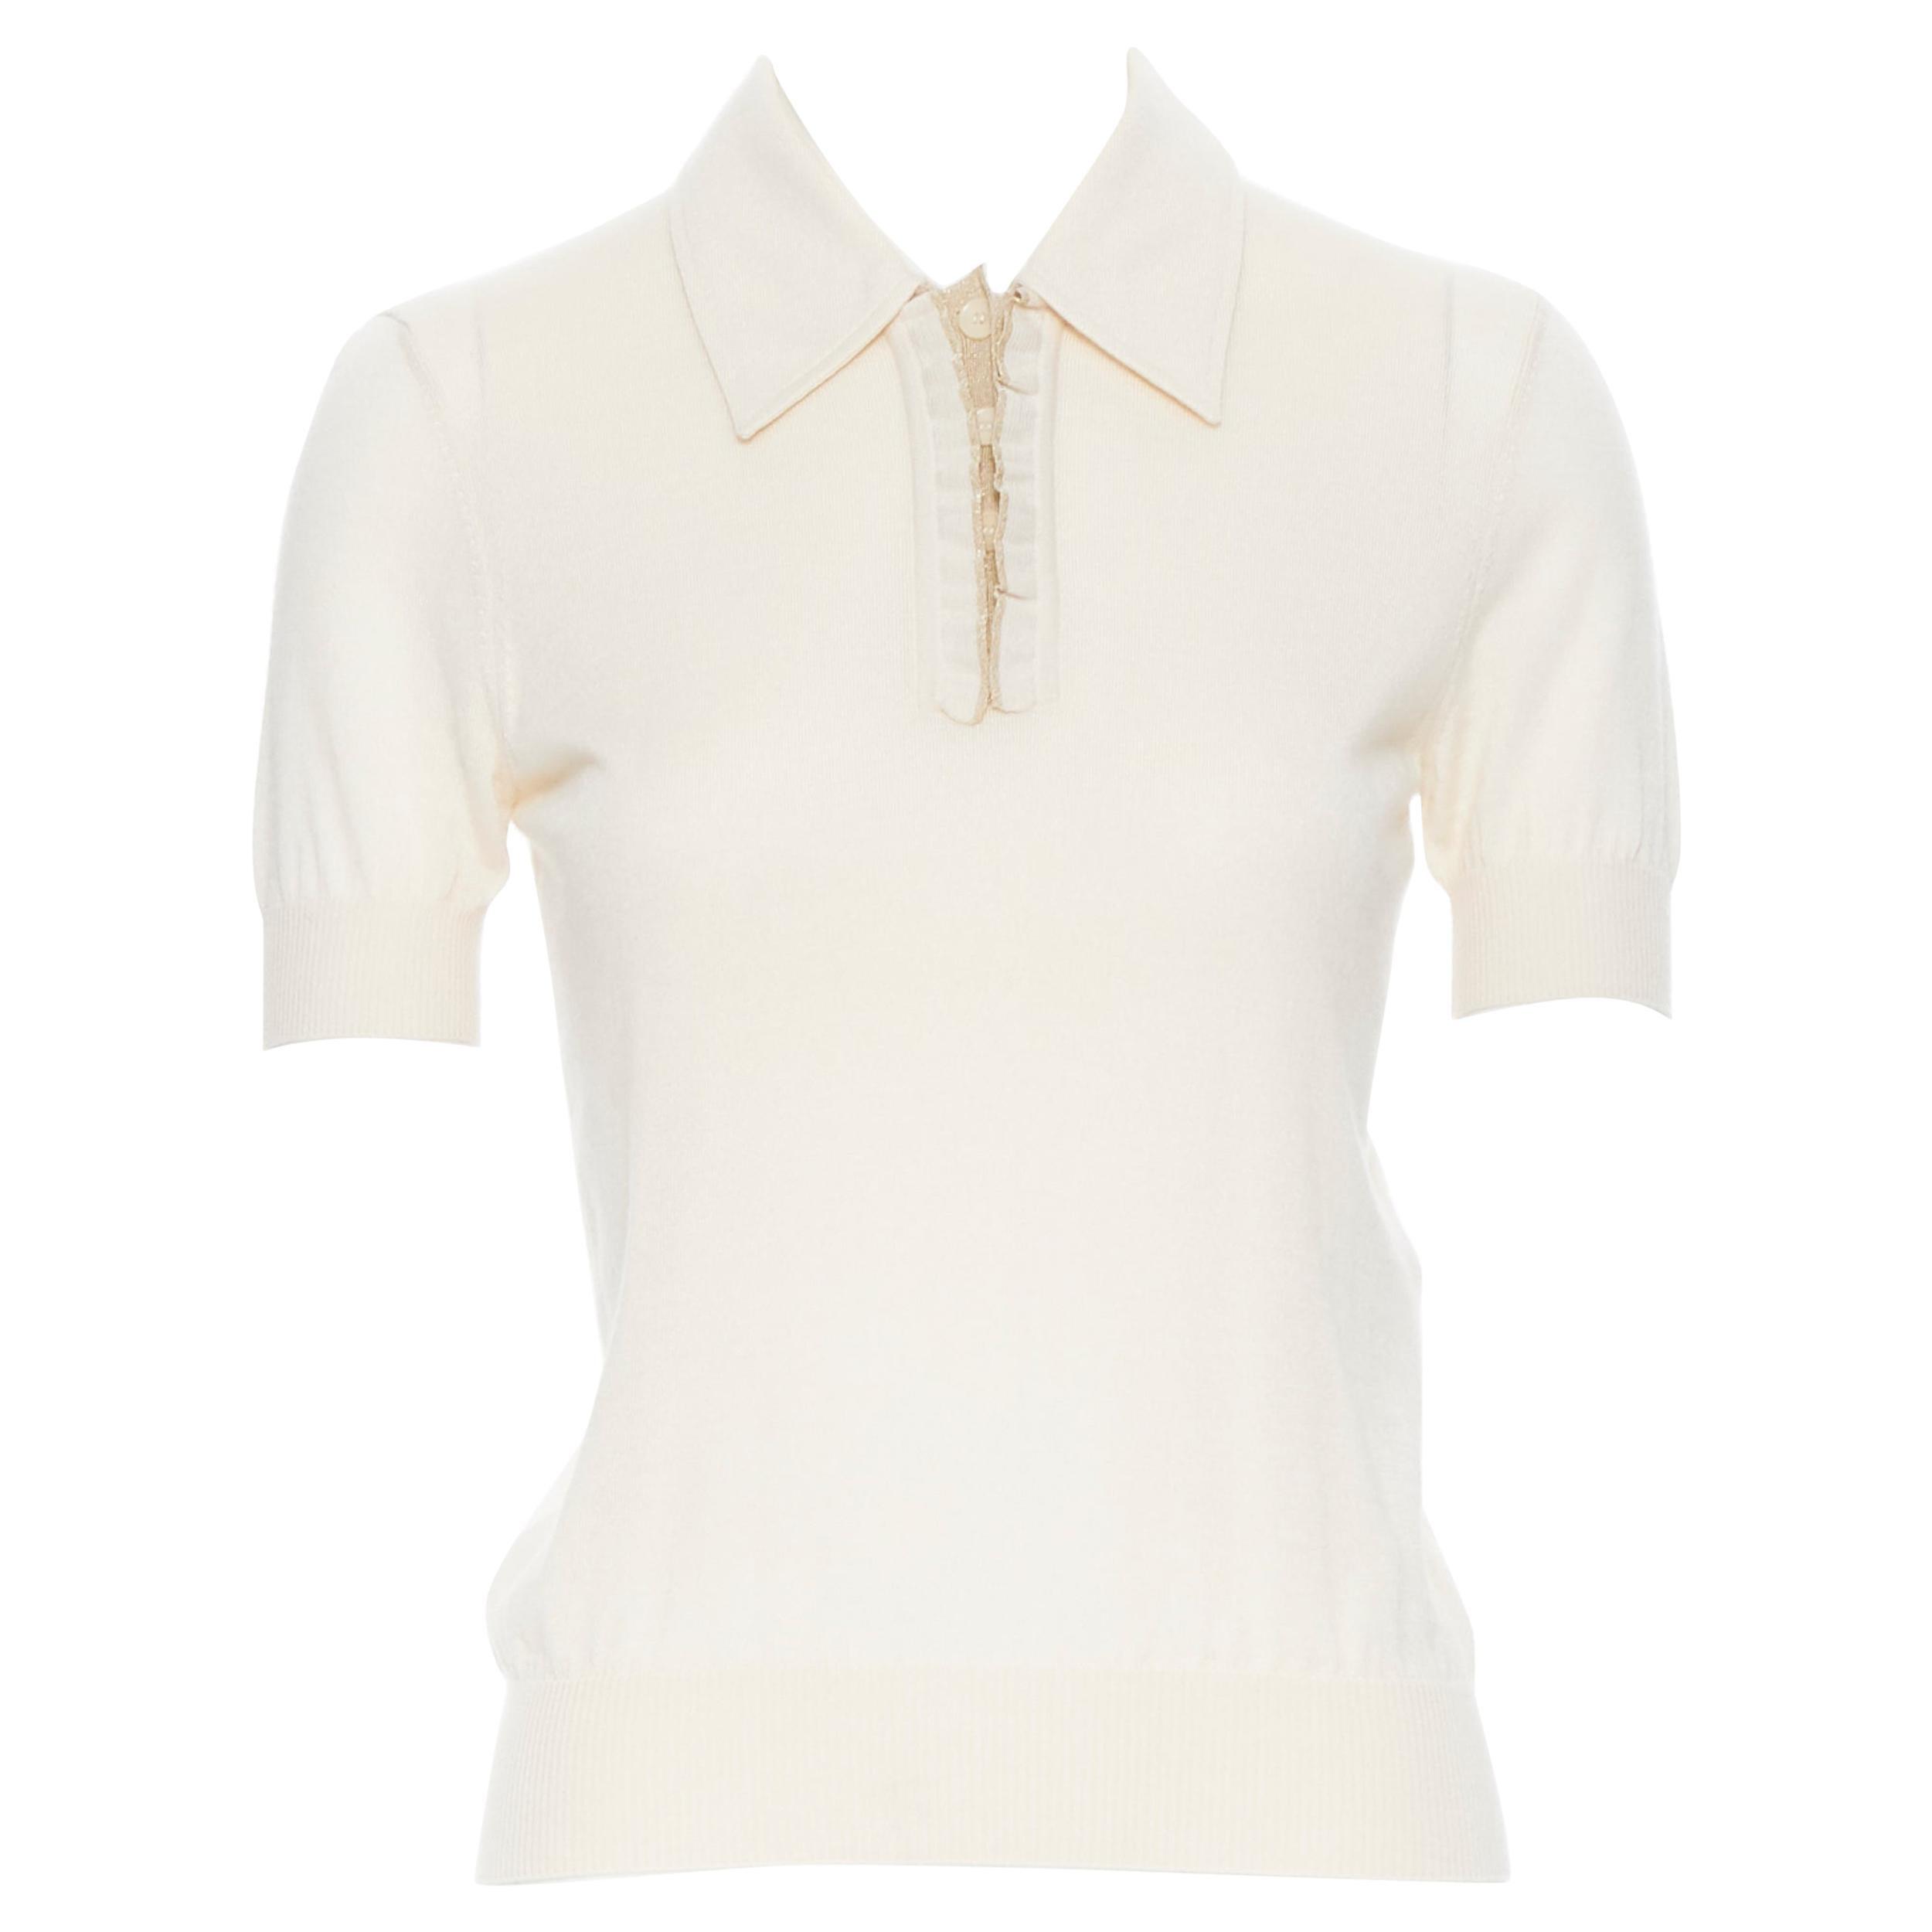 BOTTEGA VENETA cashmere silk beige gold lurex button polo sweater top IT38 XS